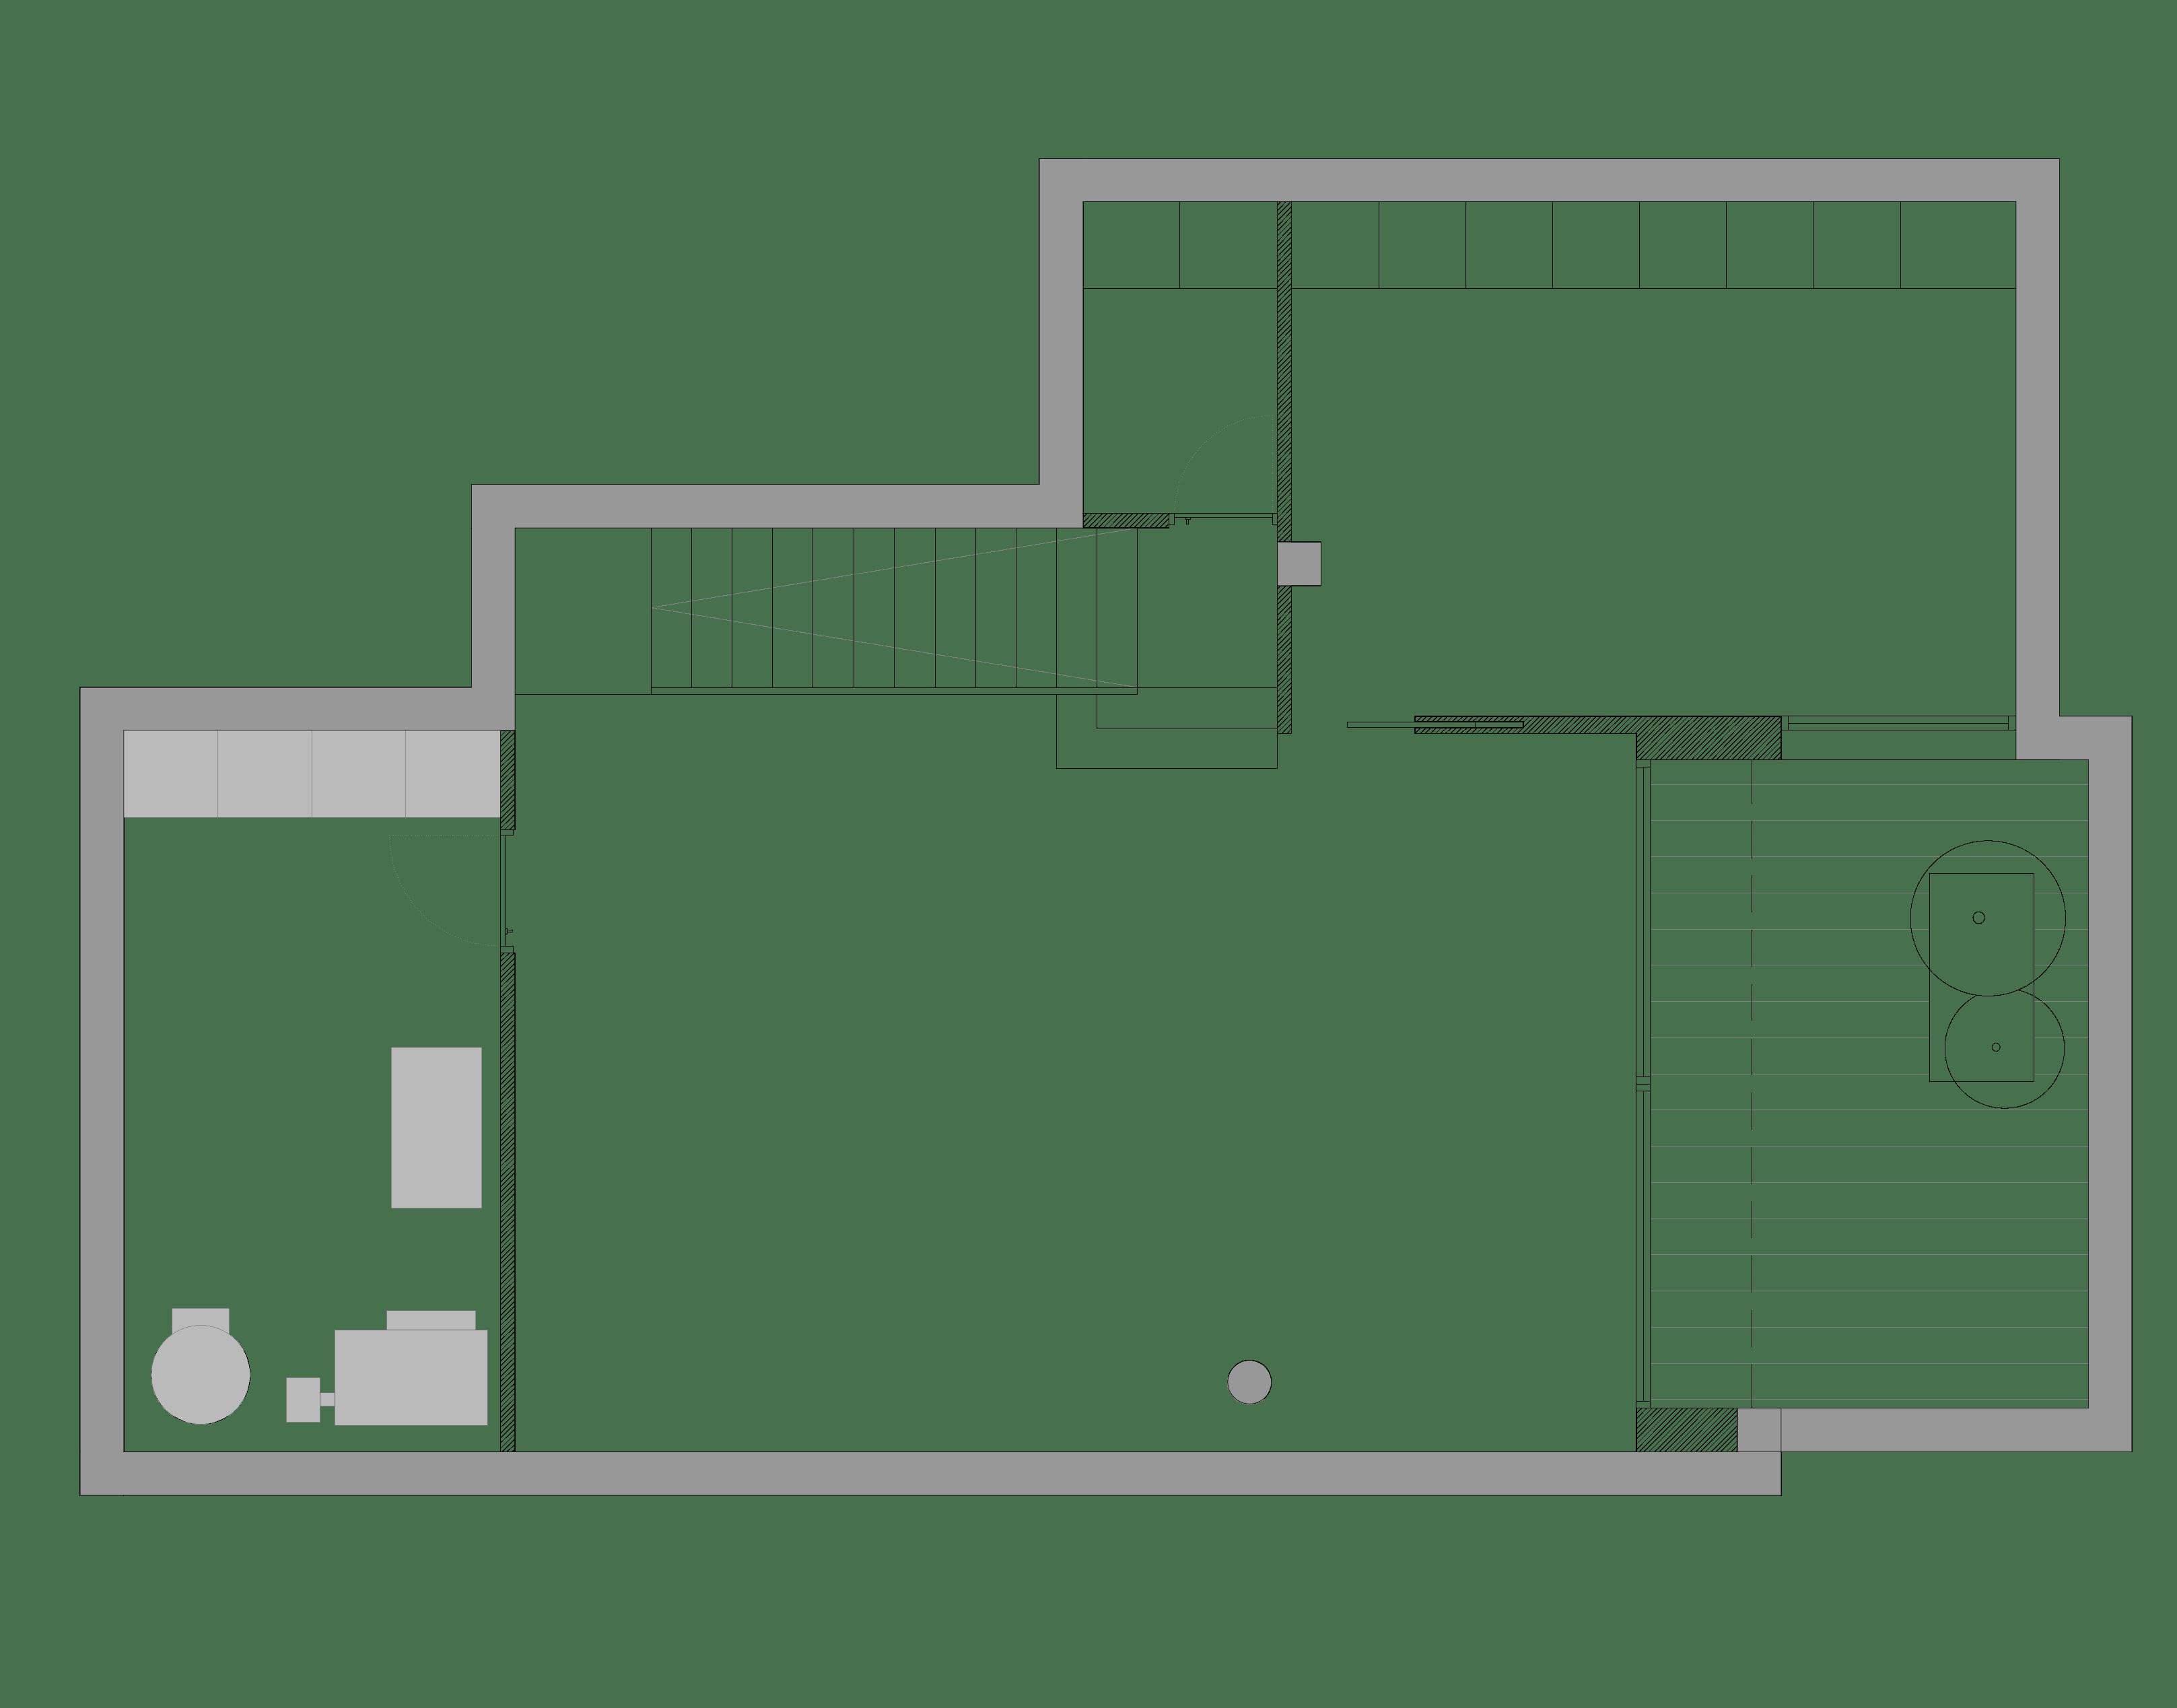 sotano-def-07-min